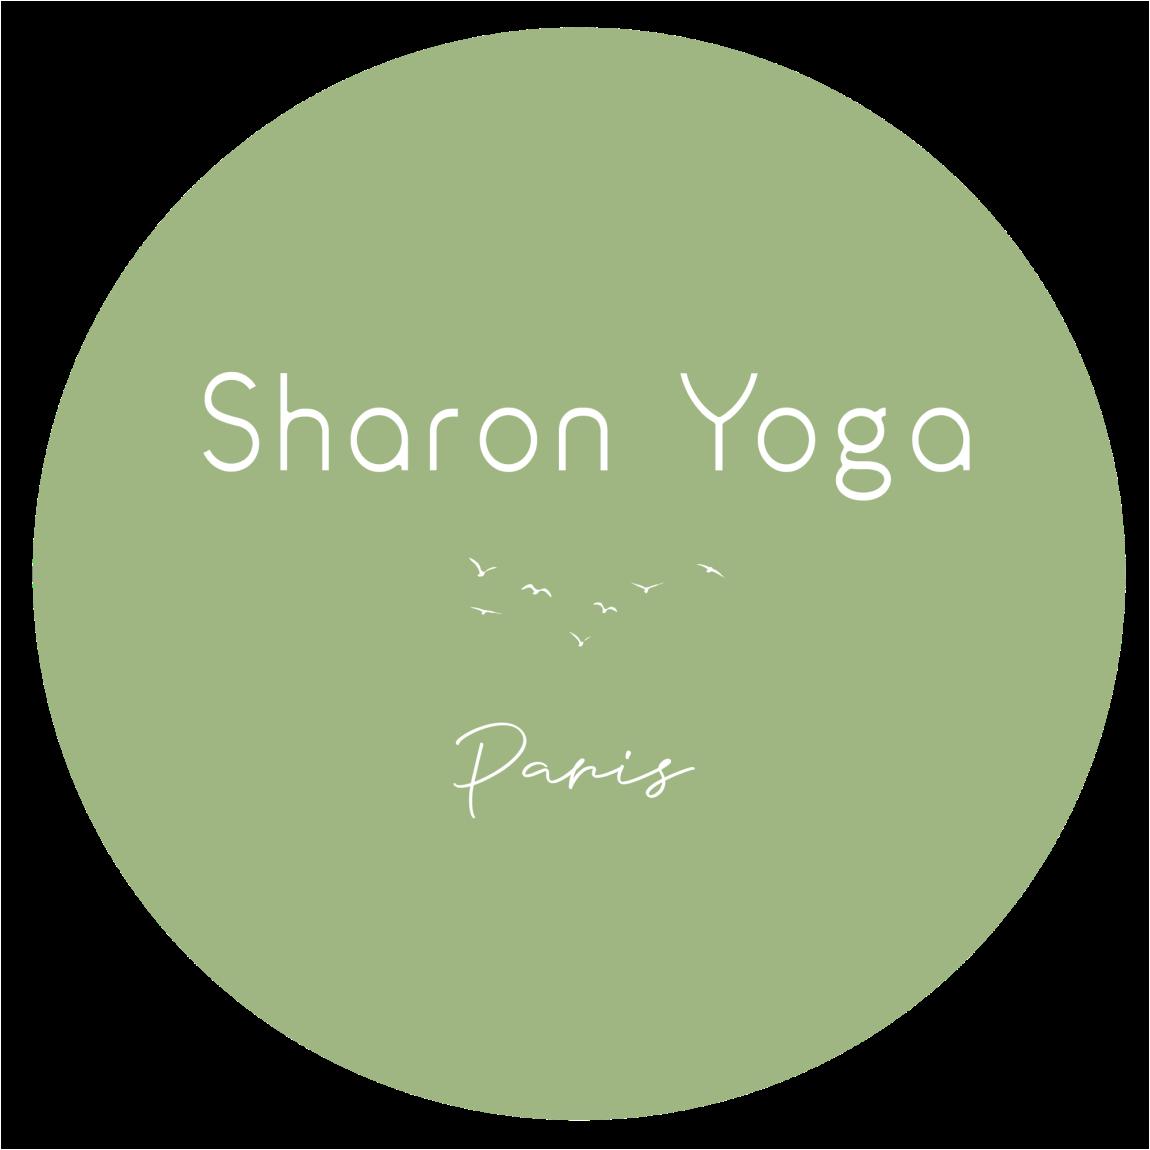 Sharon_yoga_logo_3